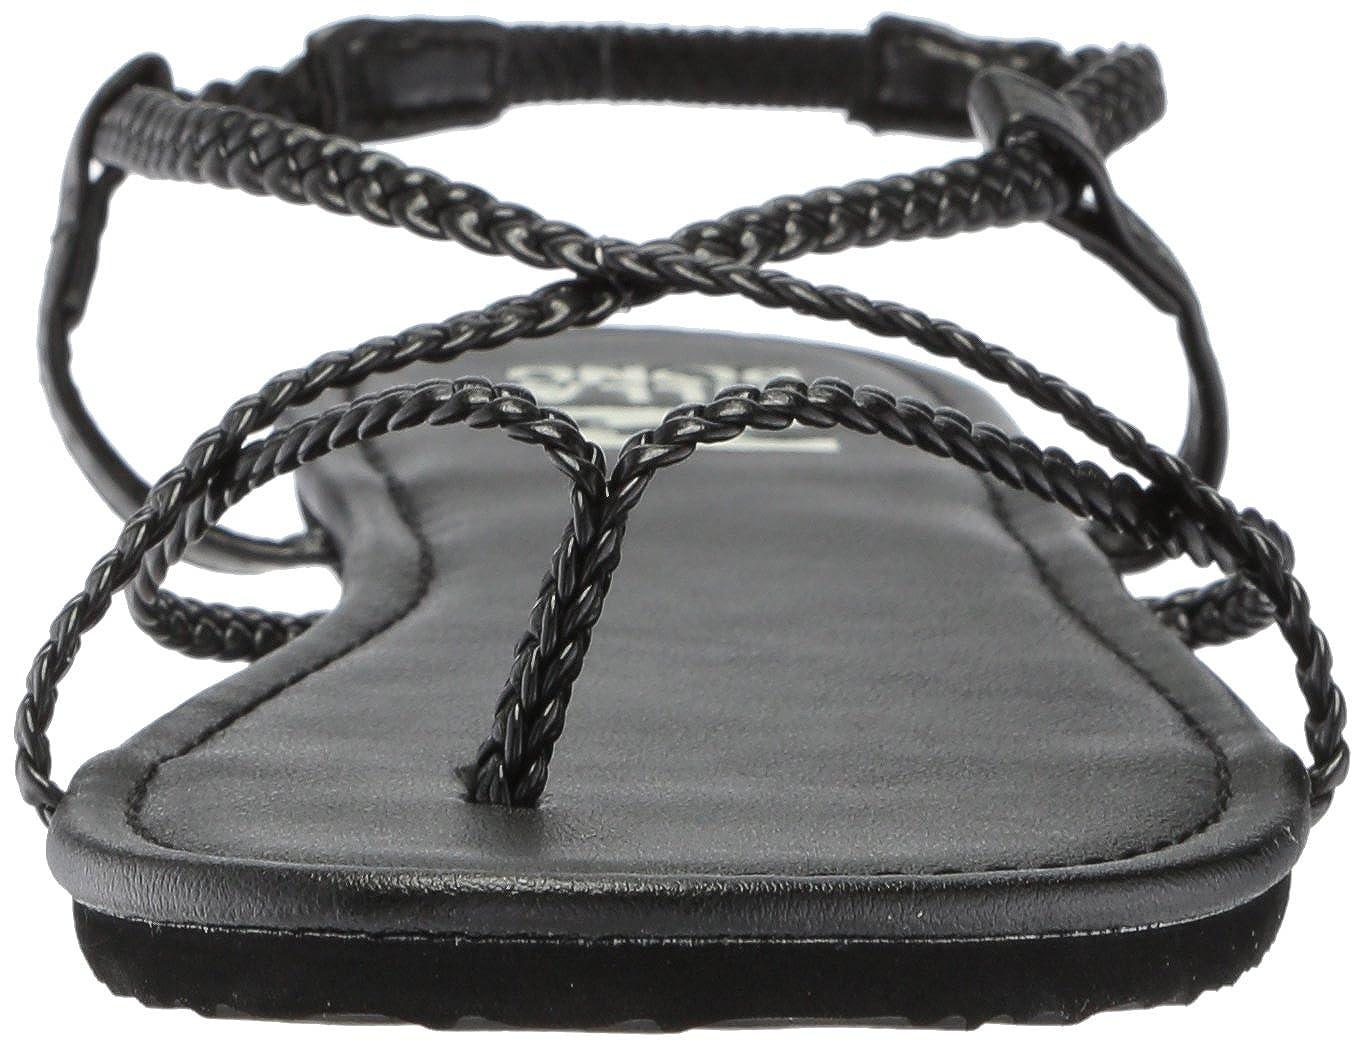 c58e0a2db Amazon.com  Billabong Women s Crossing Over Sandal  Shoes